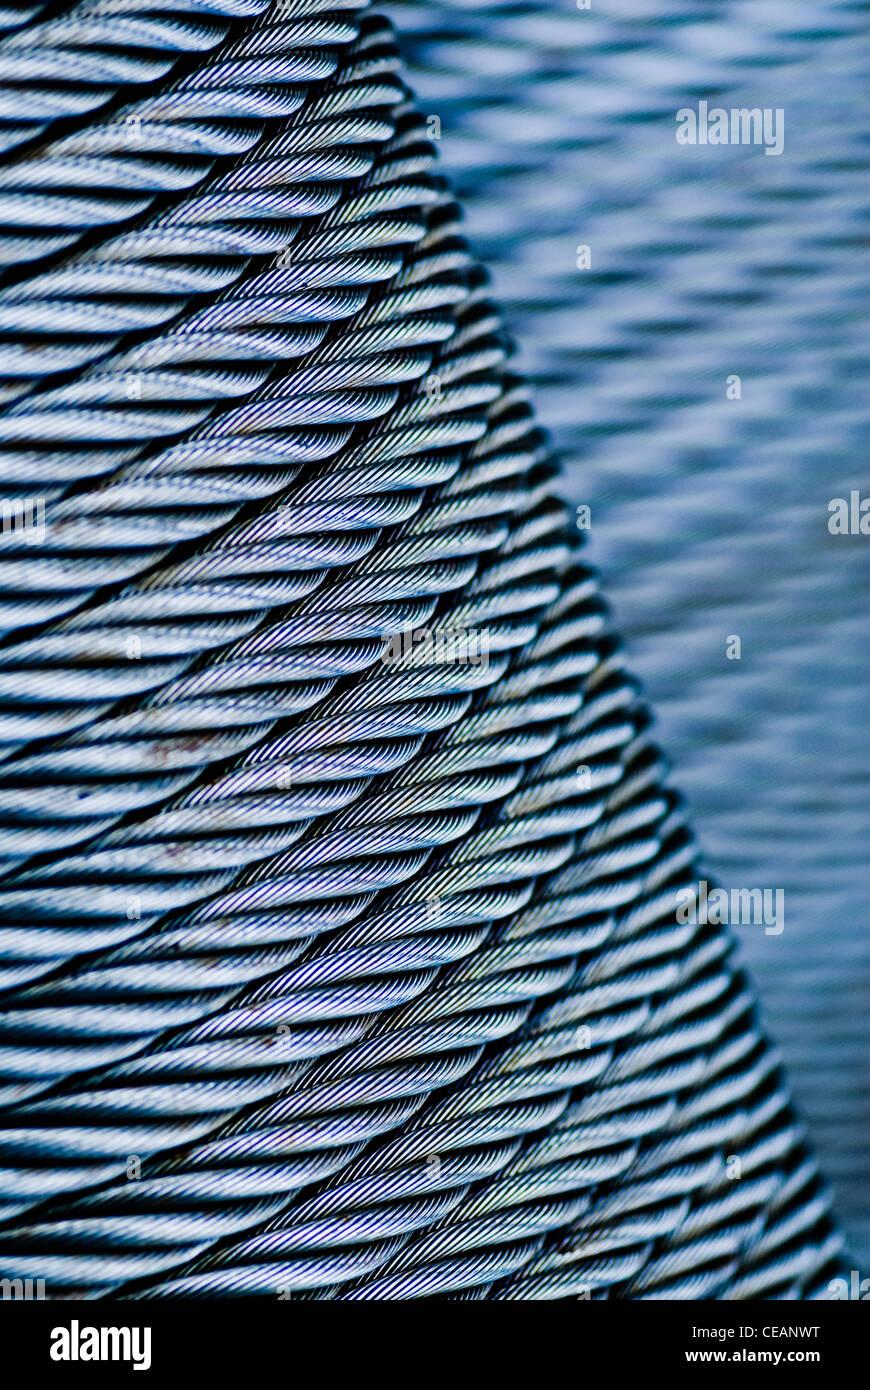 Nahaufnahme von Stahldraht Stockbild